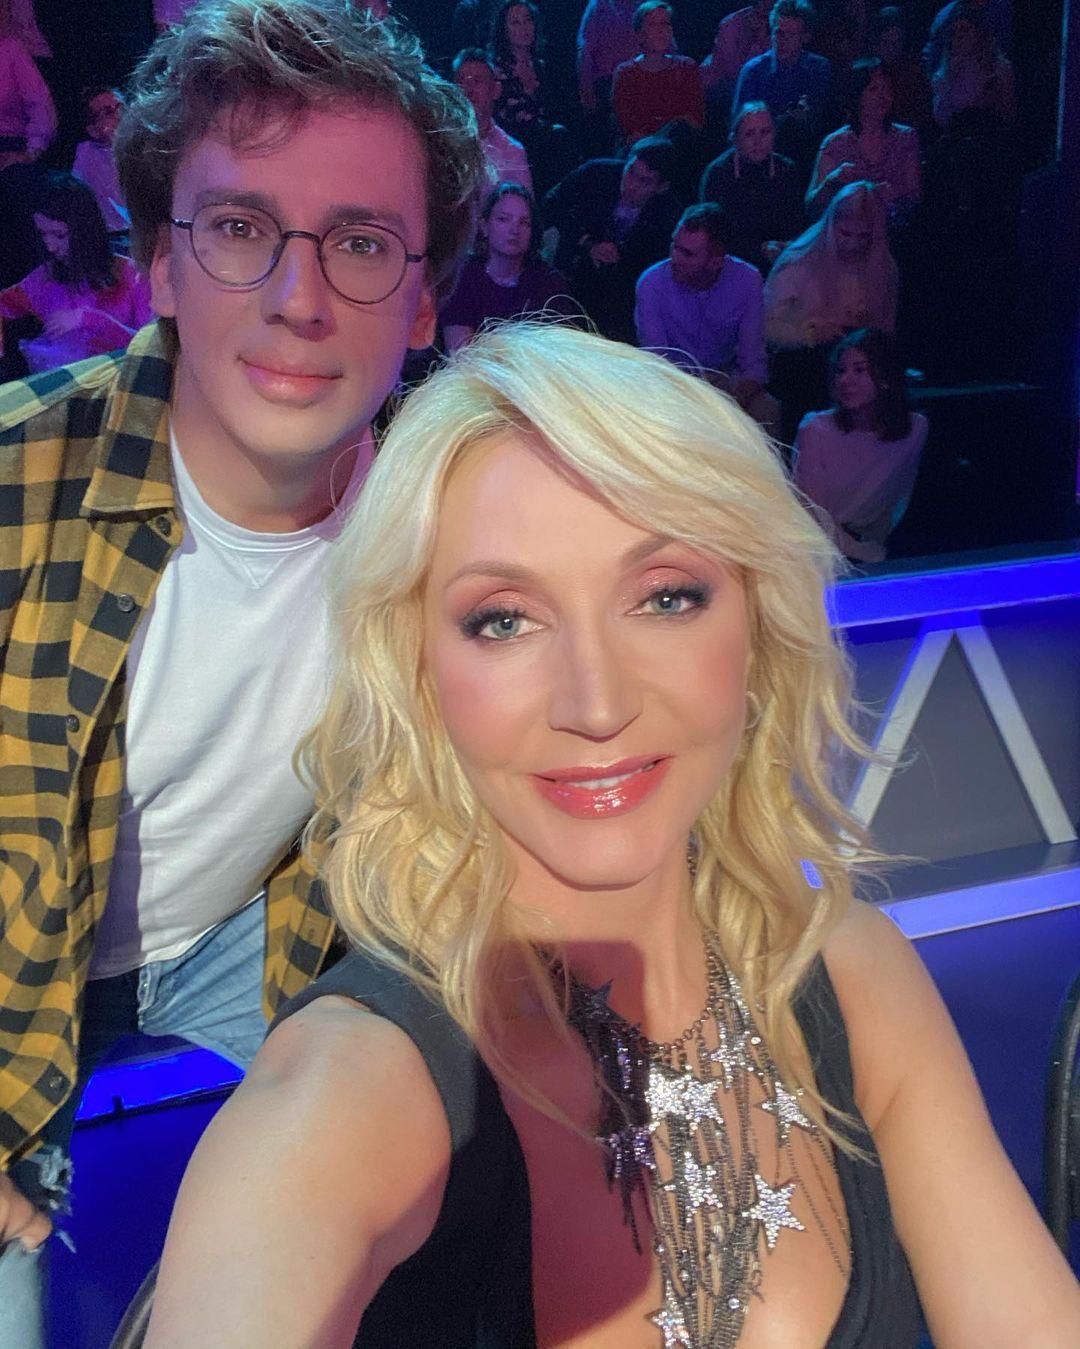 Максим Галкин и Кристина Орбакайте высмеяли желтую прессу